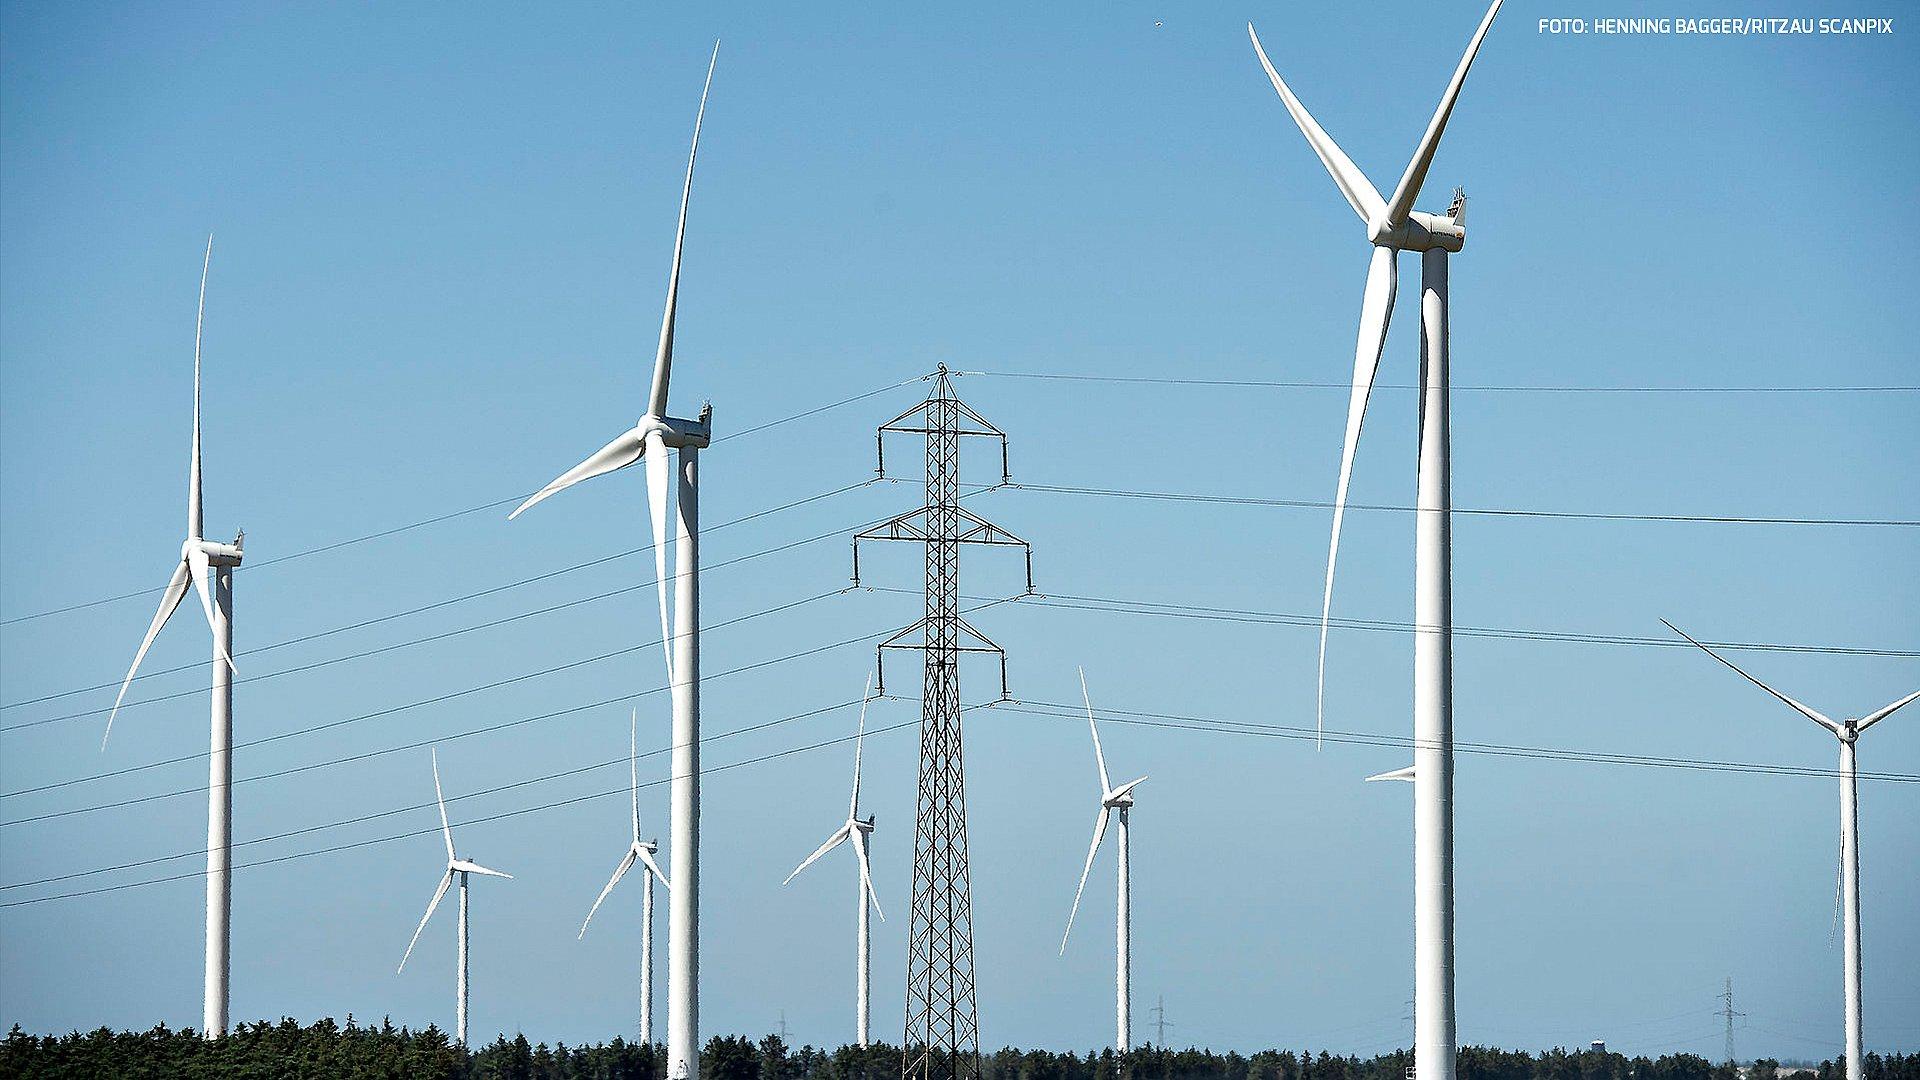 fokus.. på vindmøller